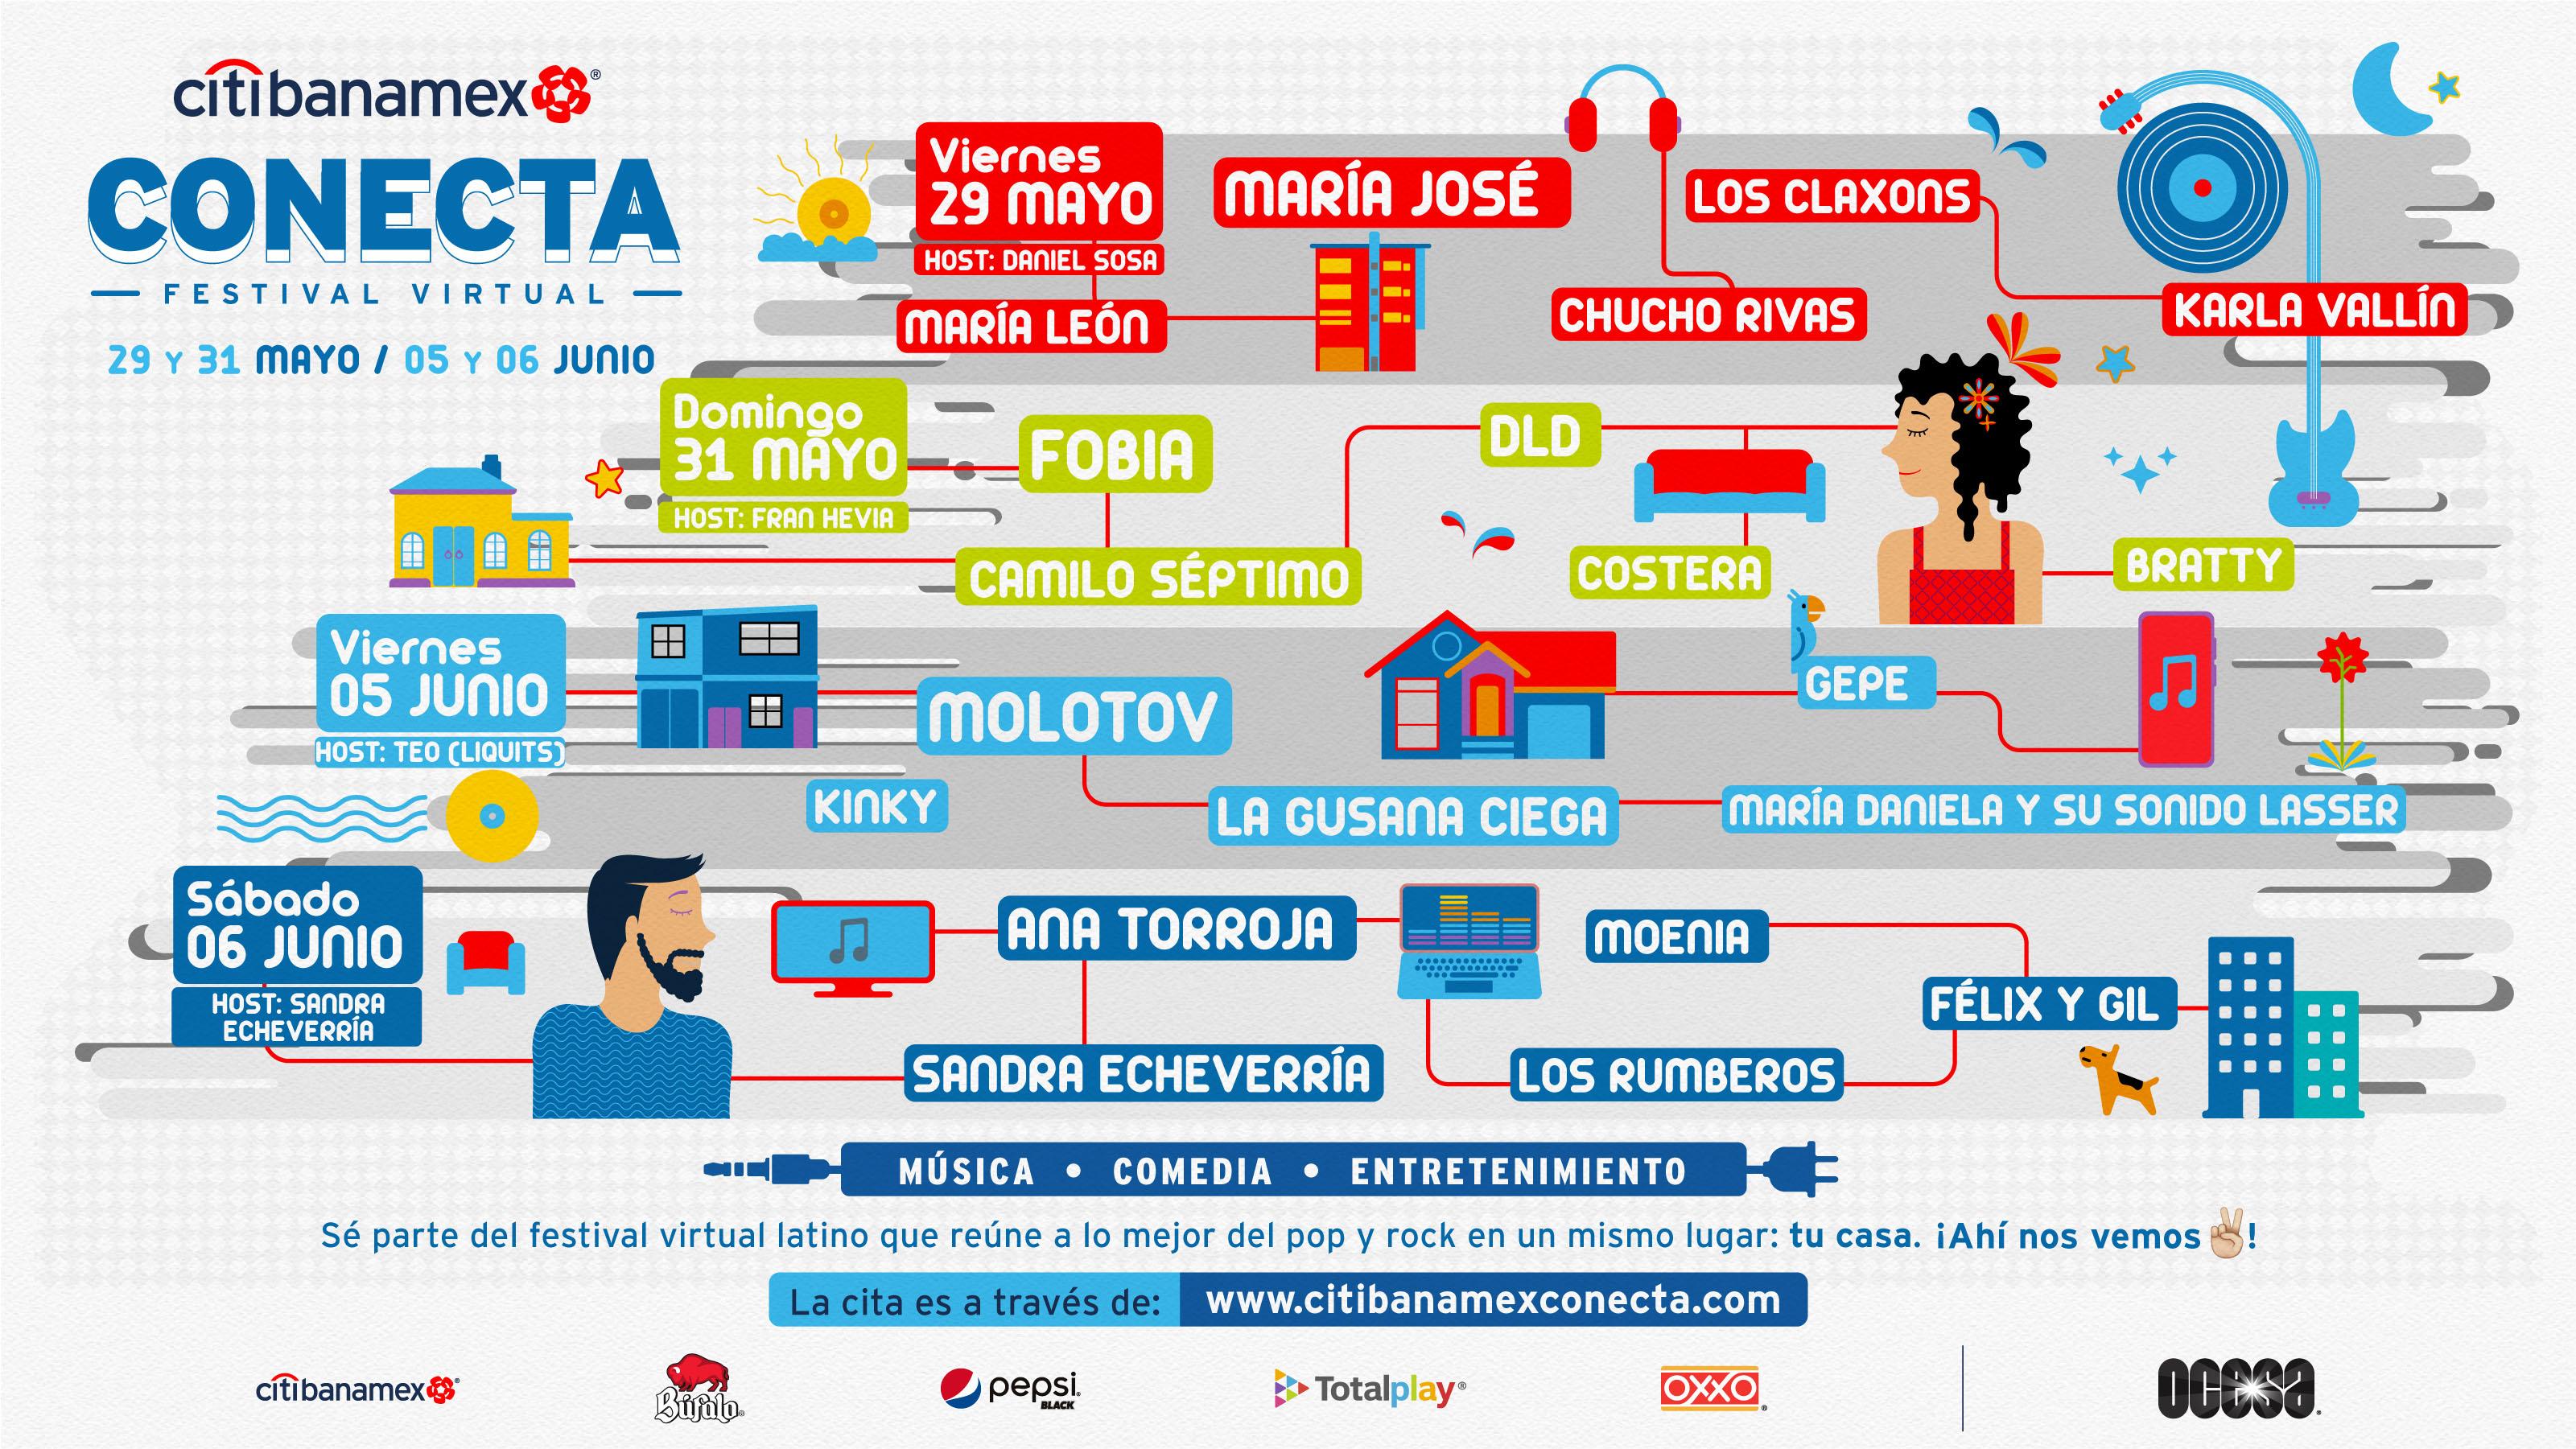 Cartel del festival virtual Citibanamex Conecta